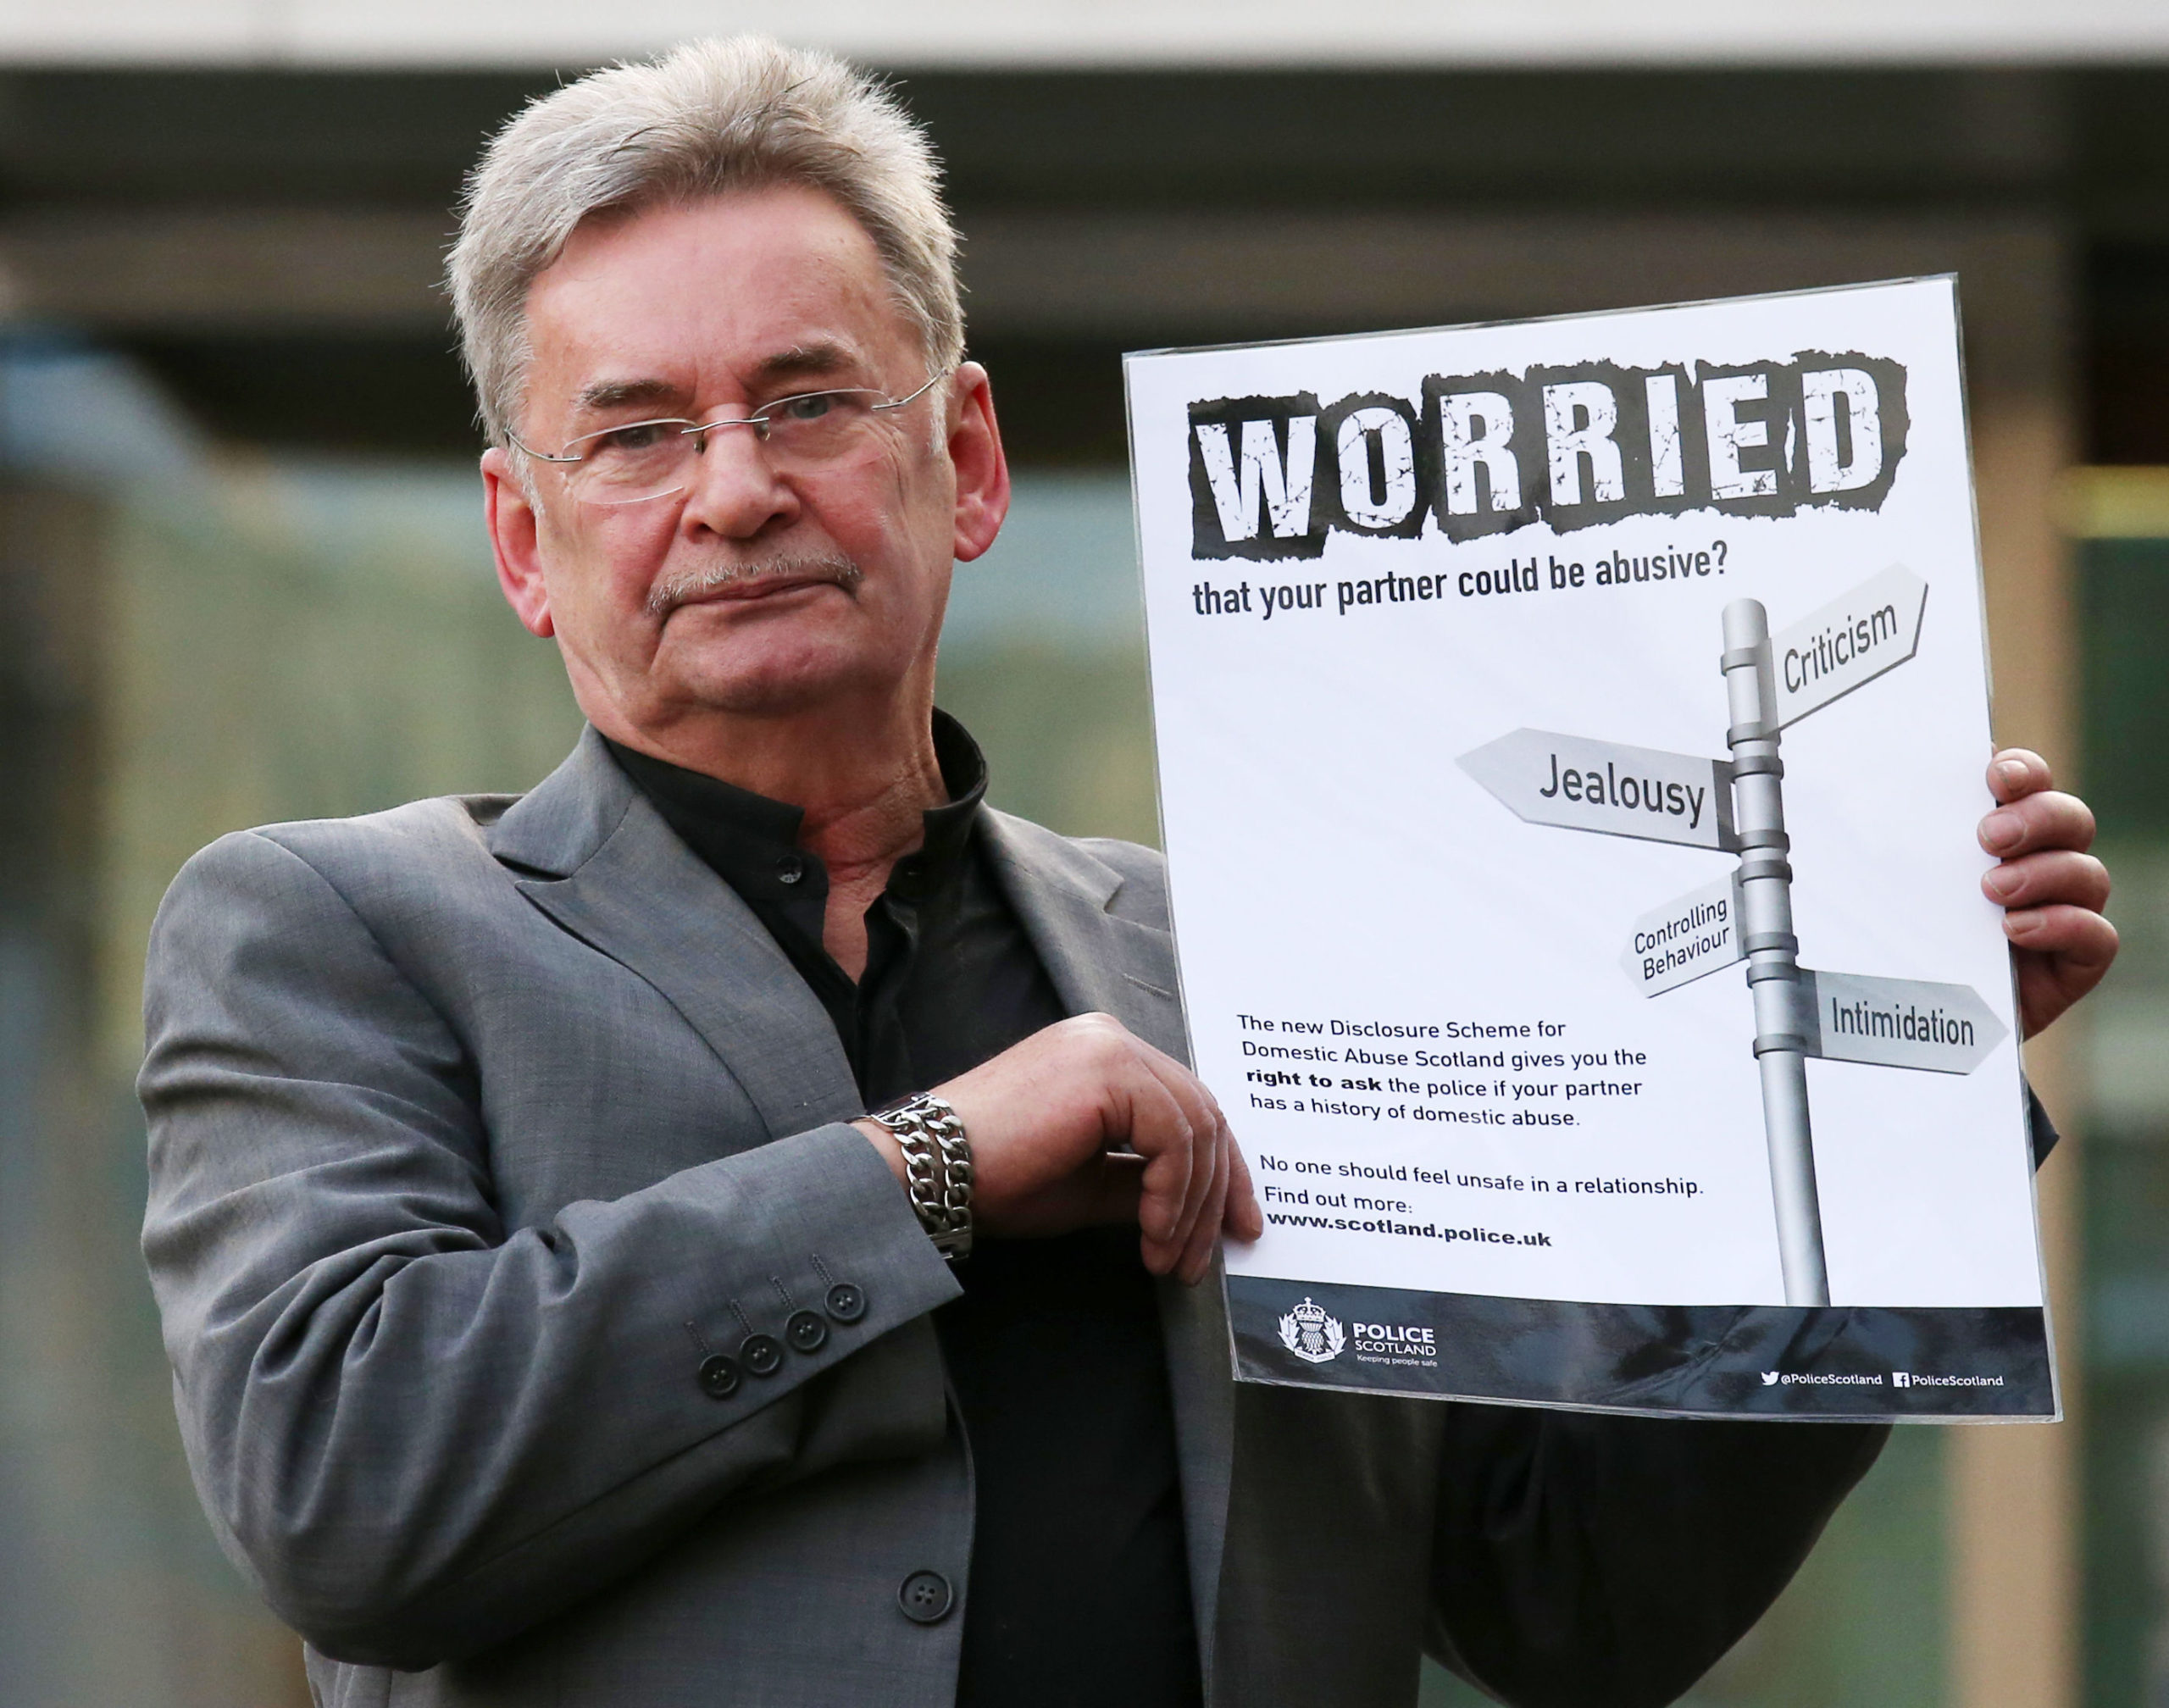 Michael Brown, whose daughter Clare was murdered by her ex boyfriend